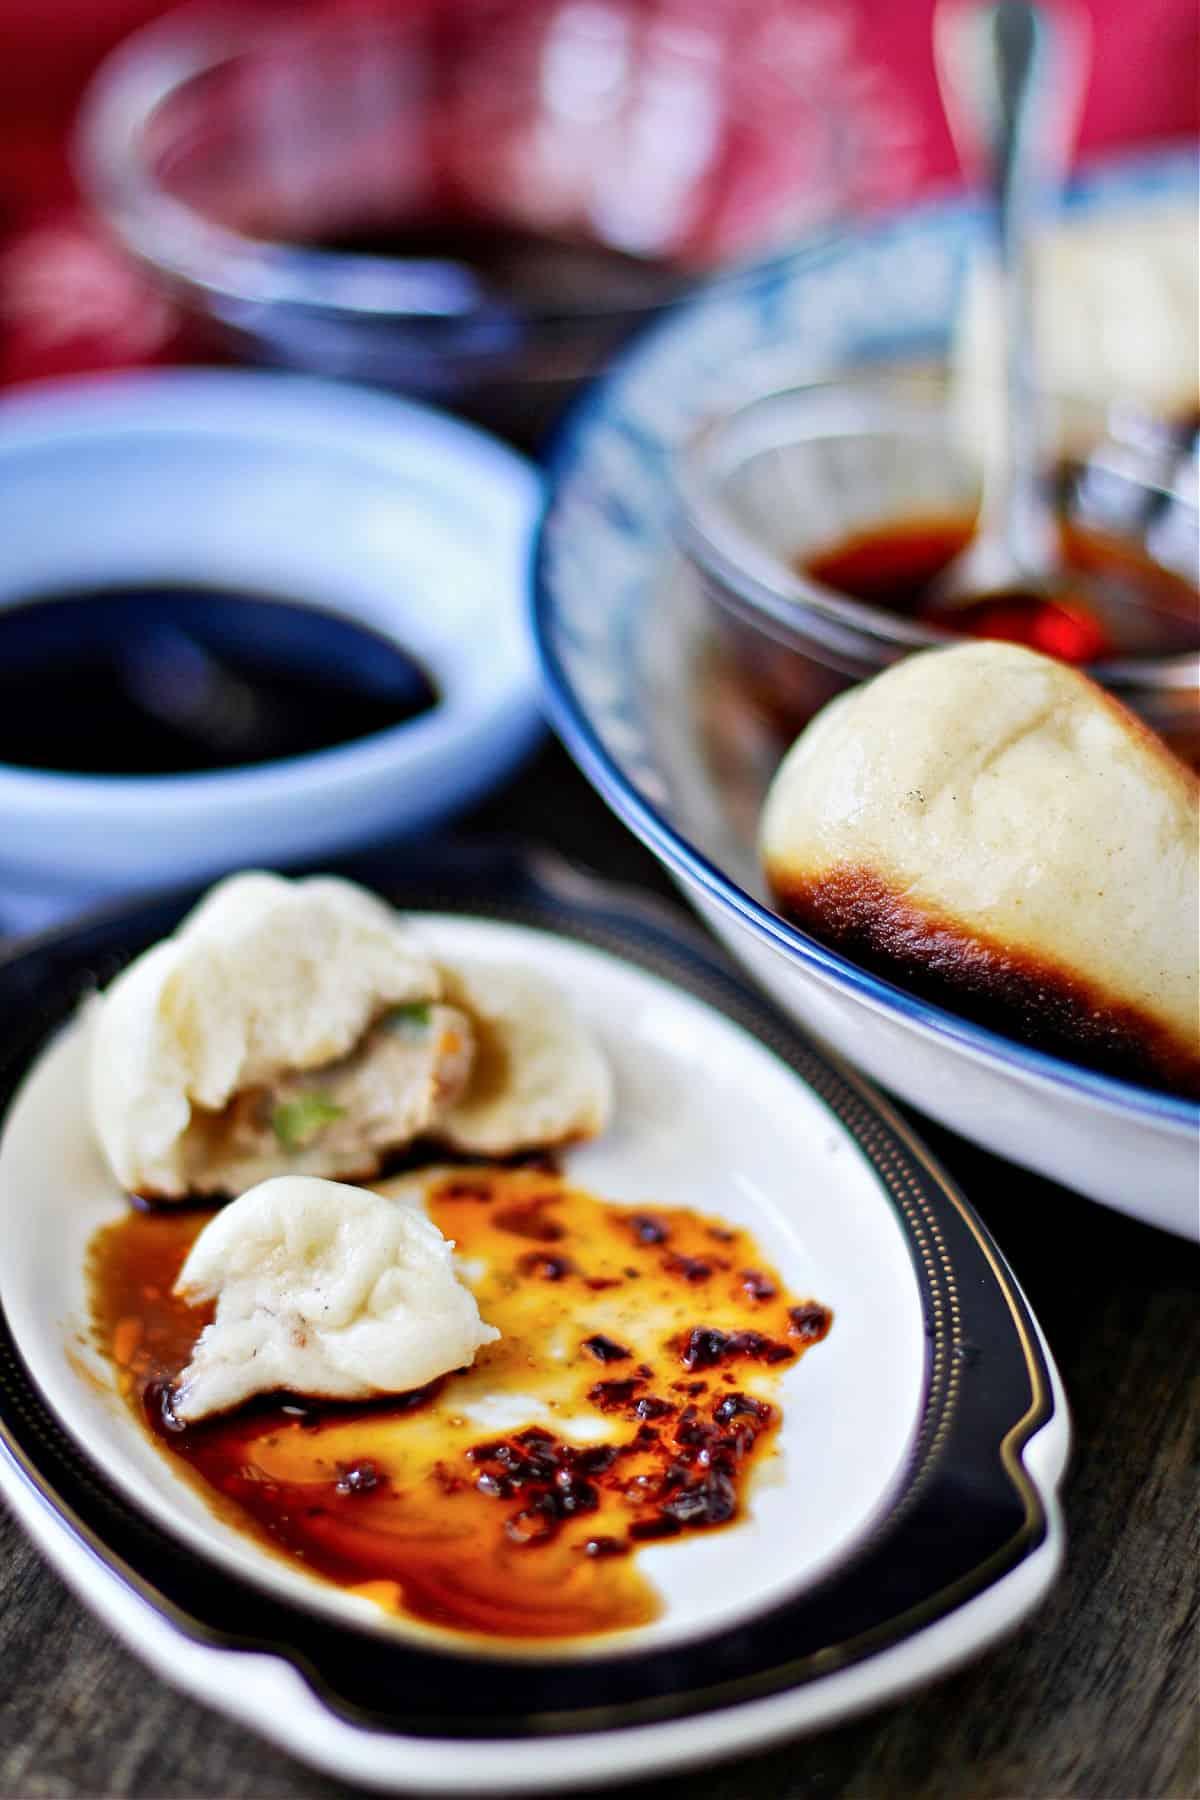 Pan Fried Pork and Scallion Buns (Shēng Jiān Bāo)  with dipping sauce.